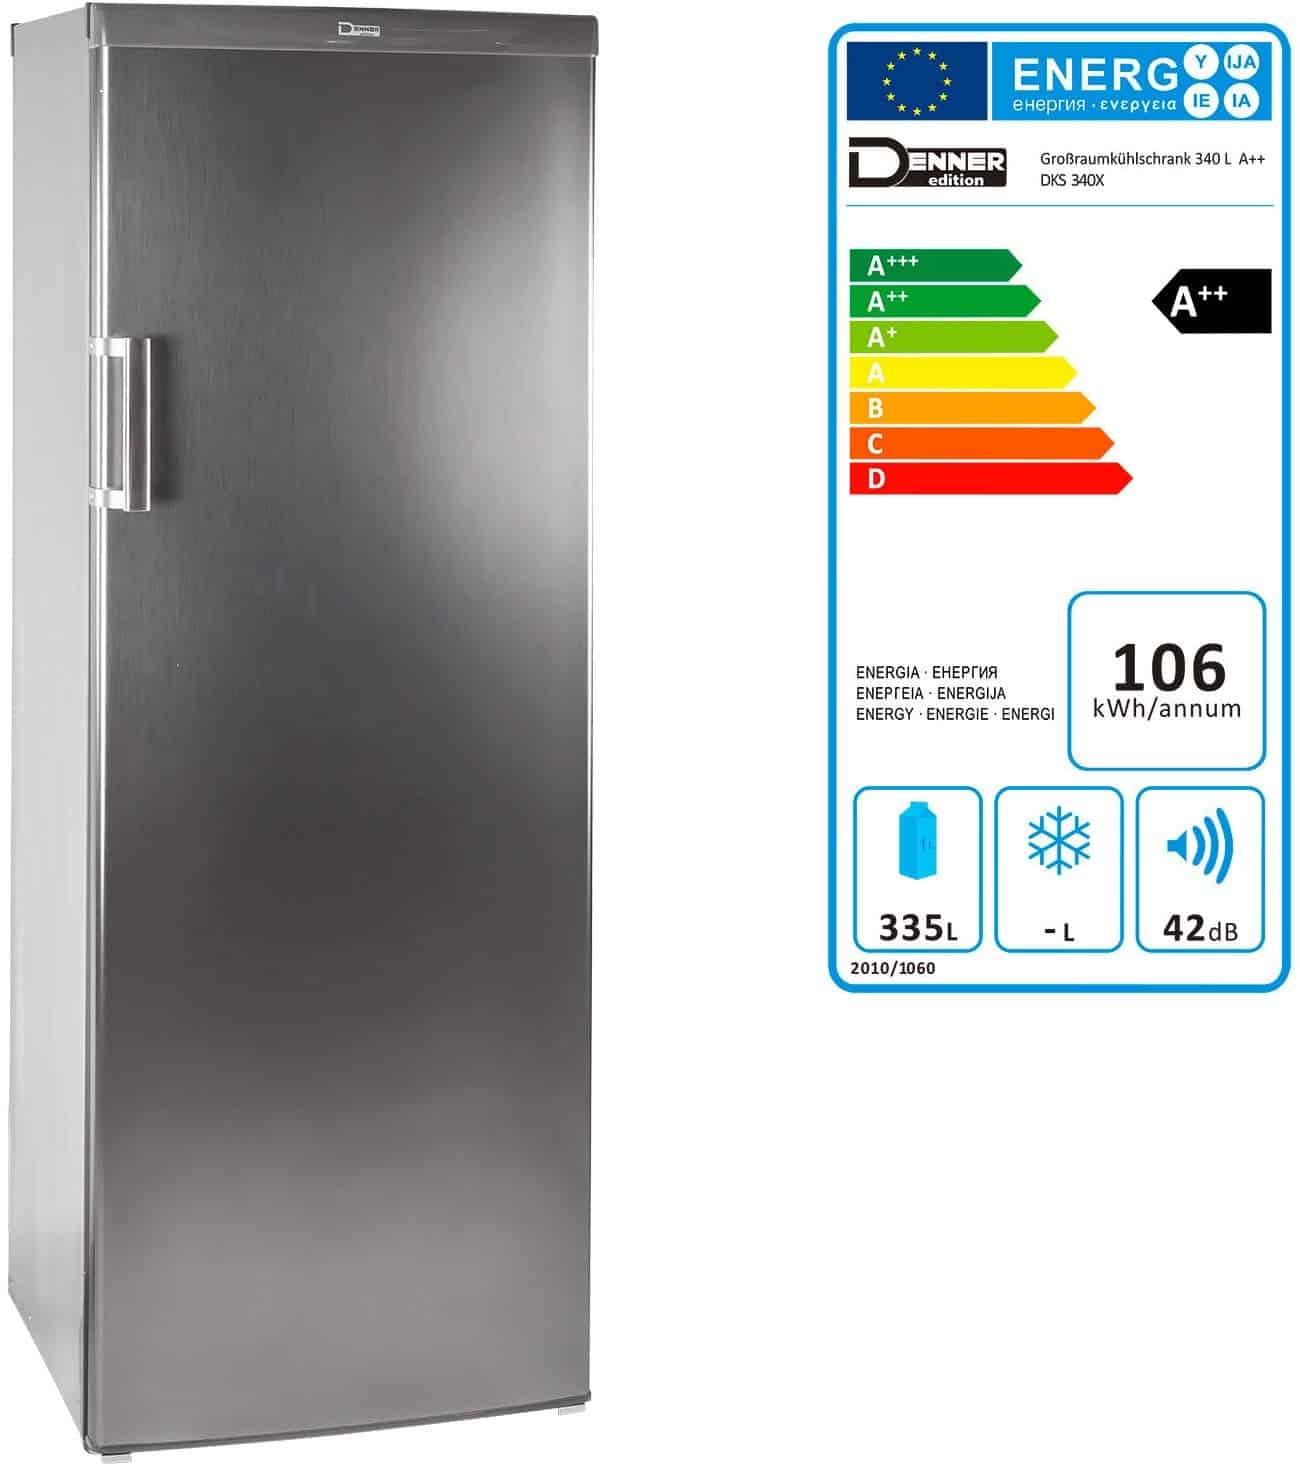 Großraum Kühlschrank